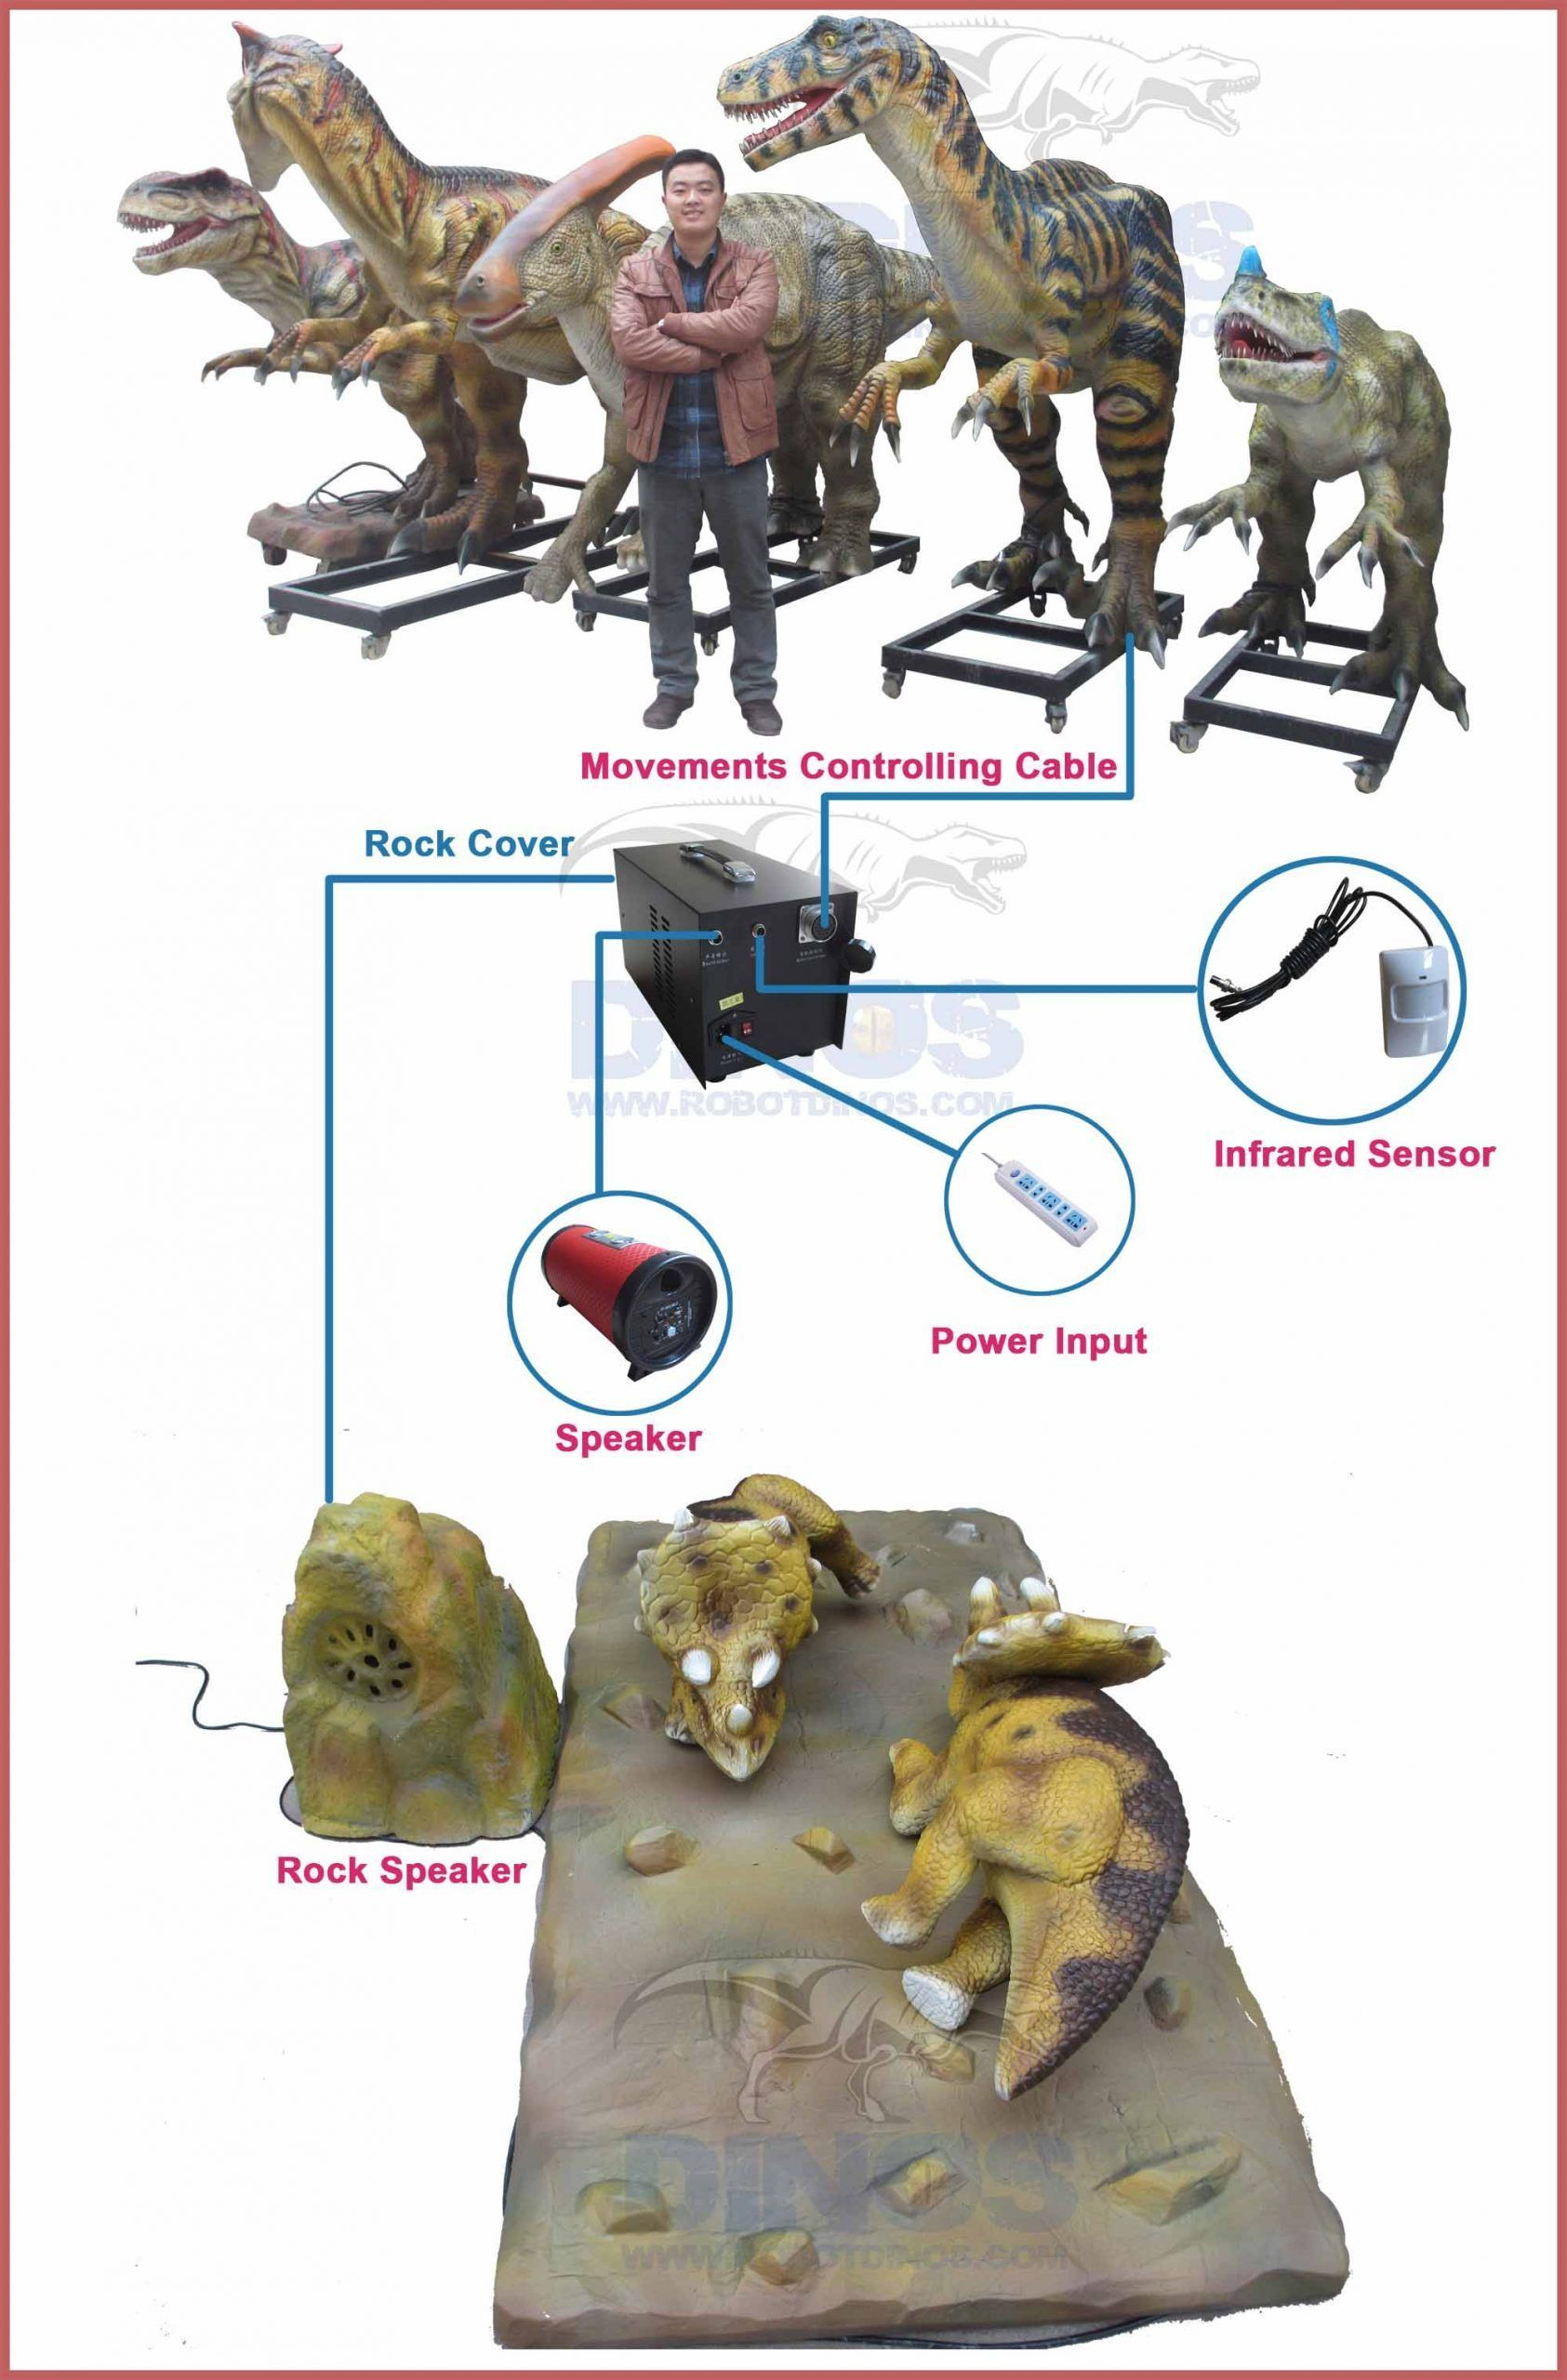 How-To-Use-Animatronic-Dinosaurs